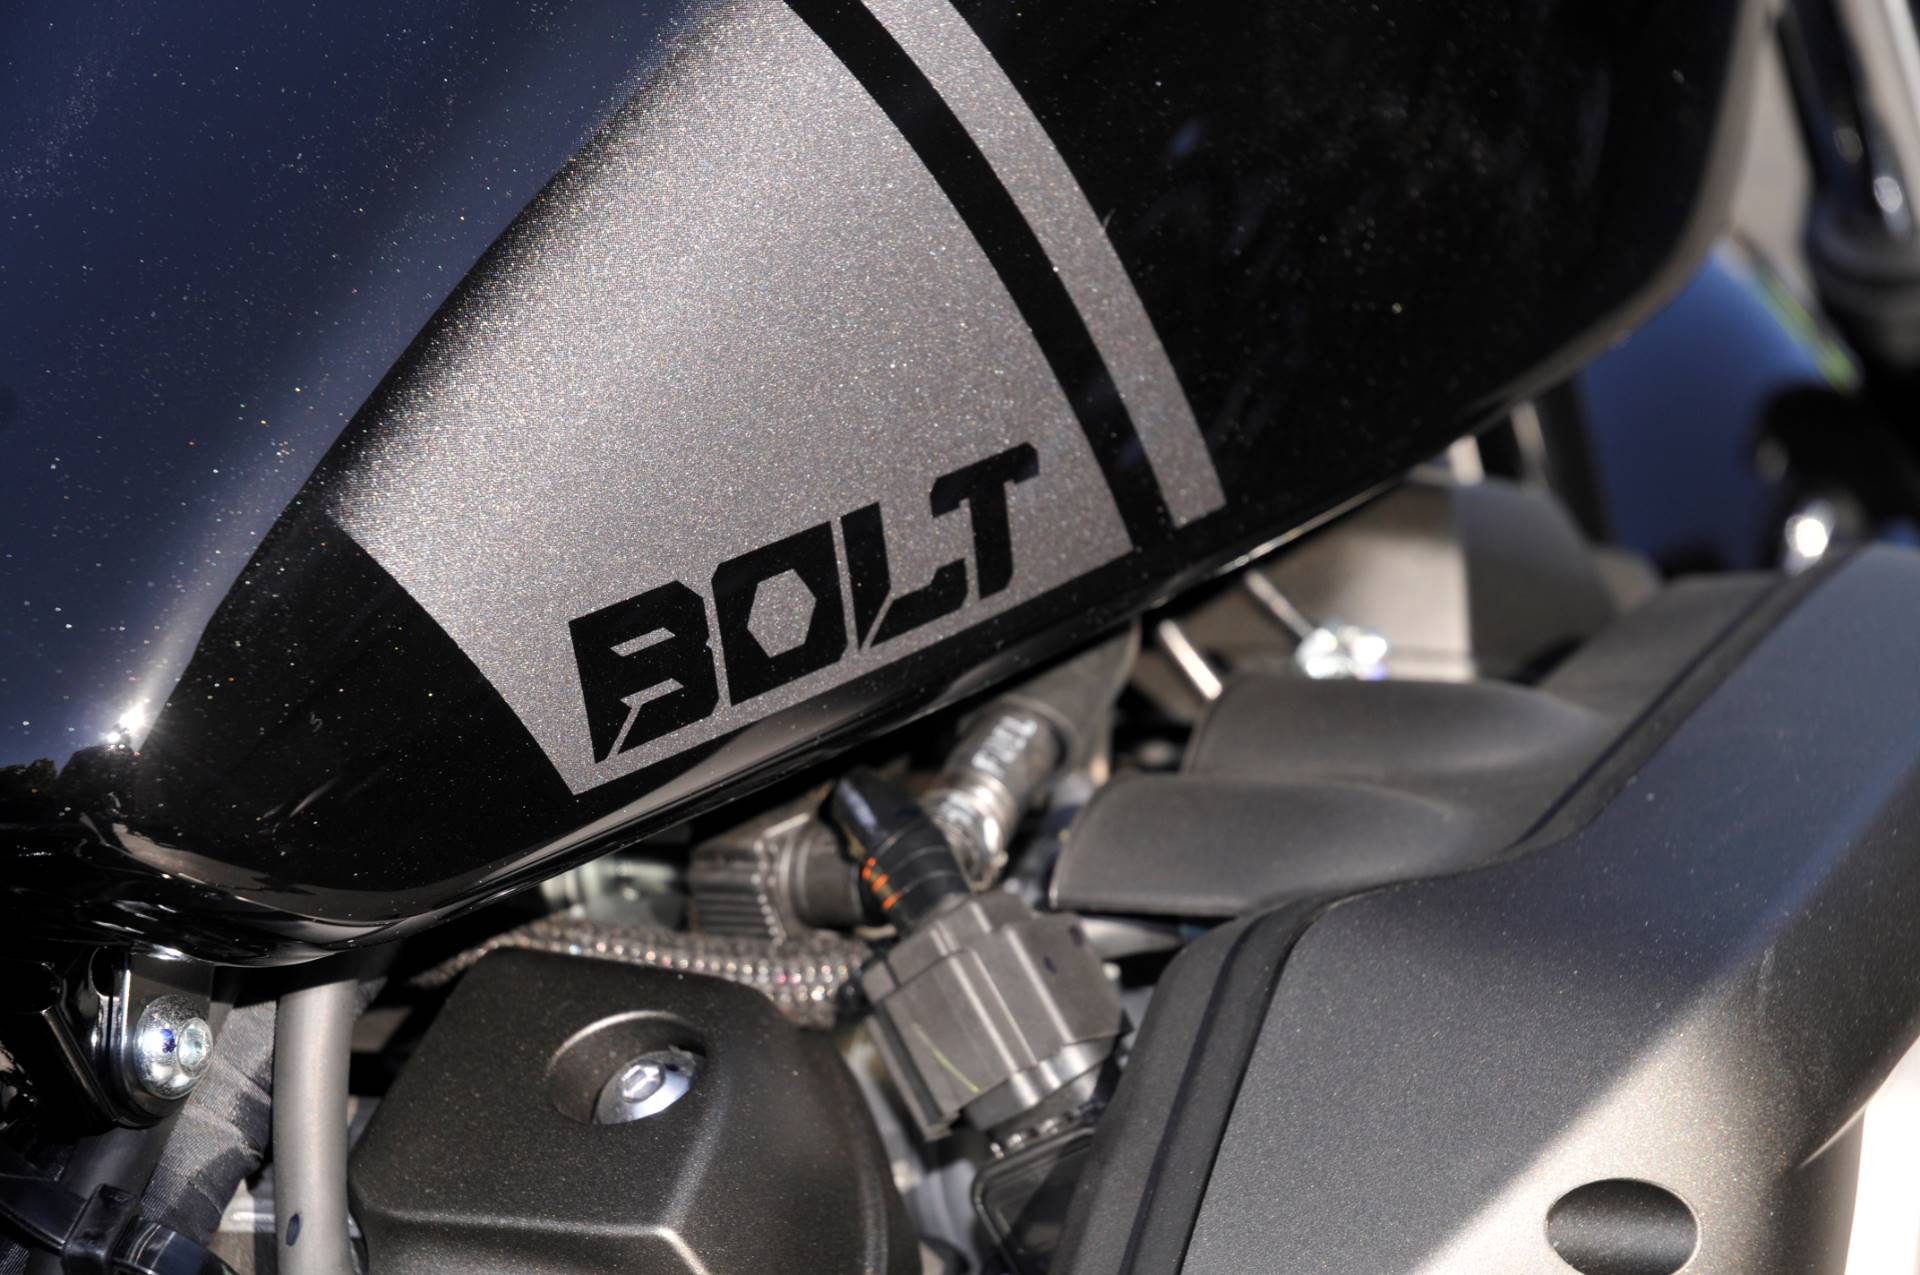 2017 Yamaha Bolt in Roseville, California